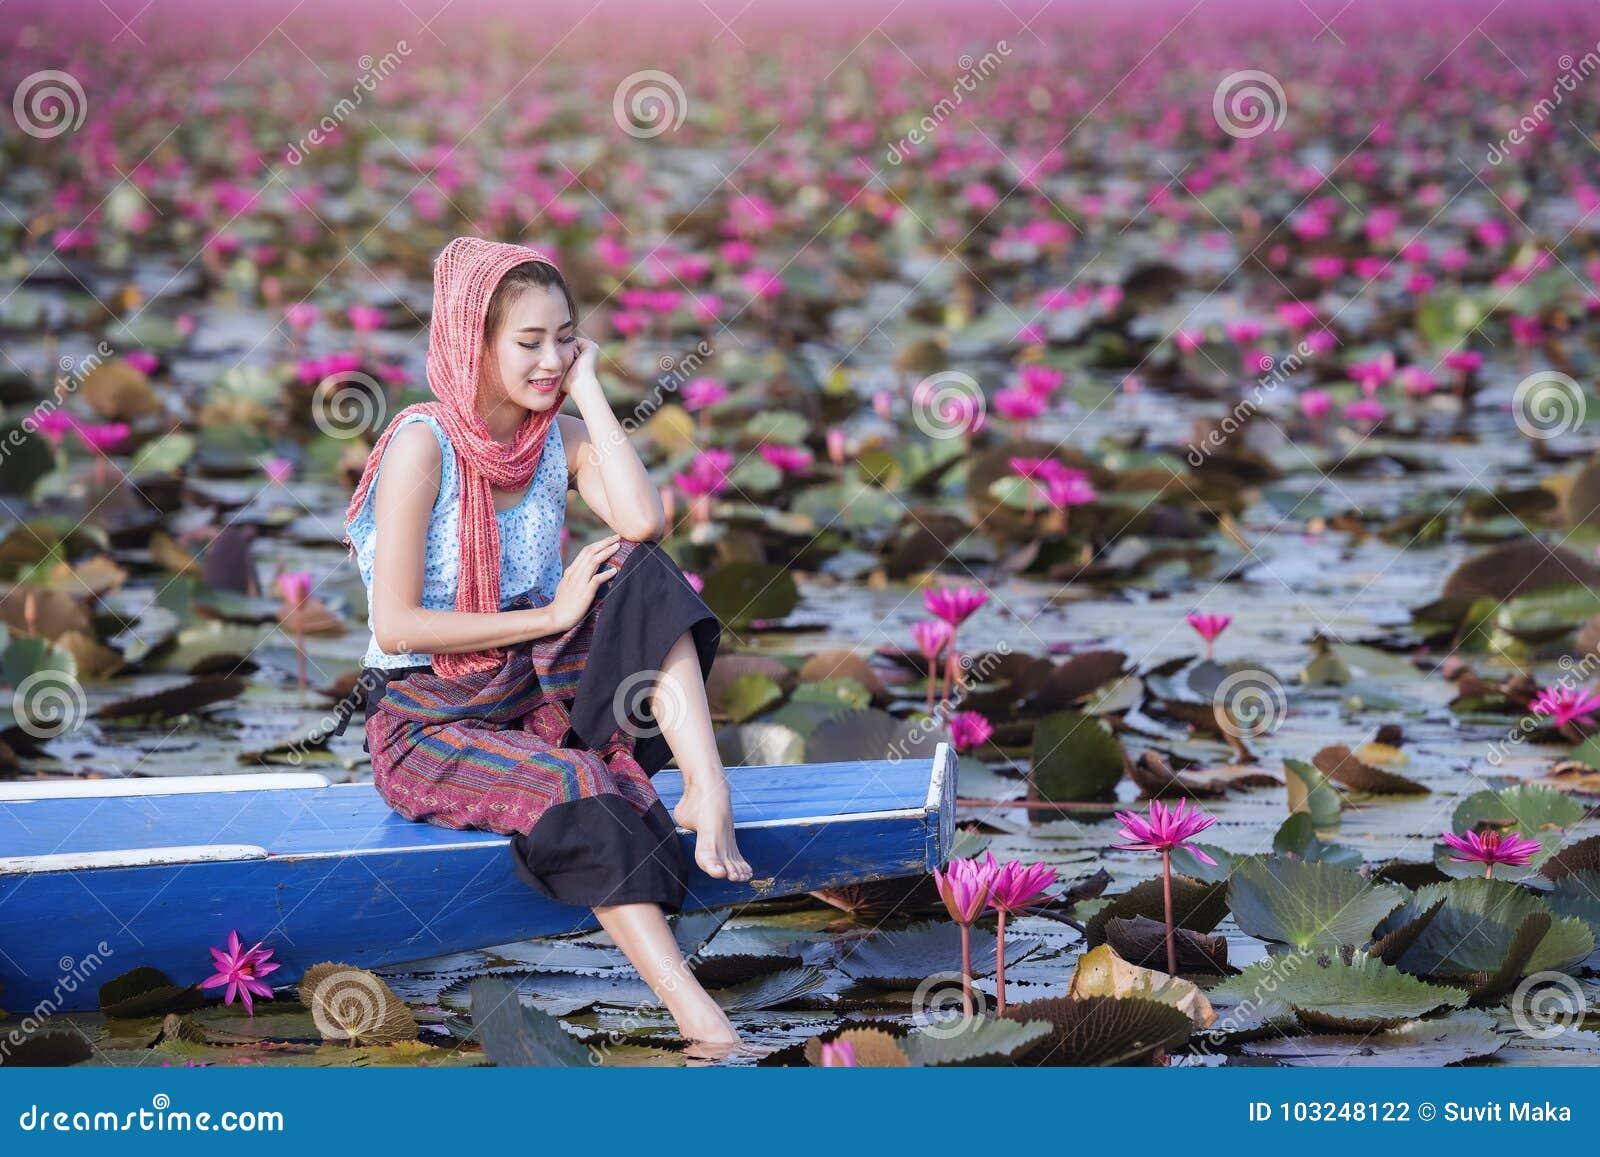 Lotus Flower Acoustic Choice Image Flower Wallpaper Hd